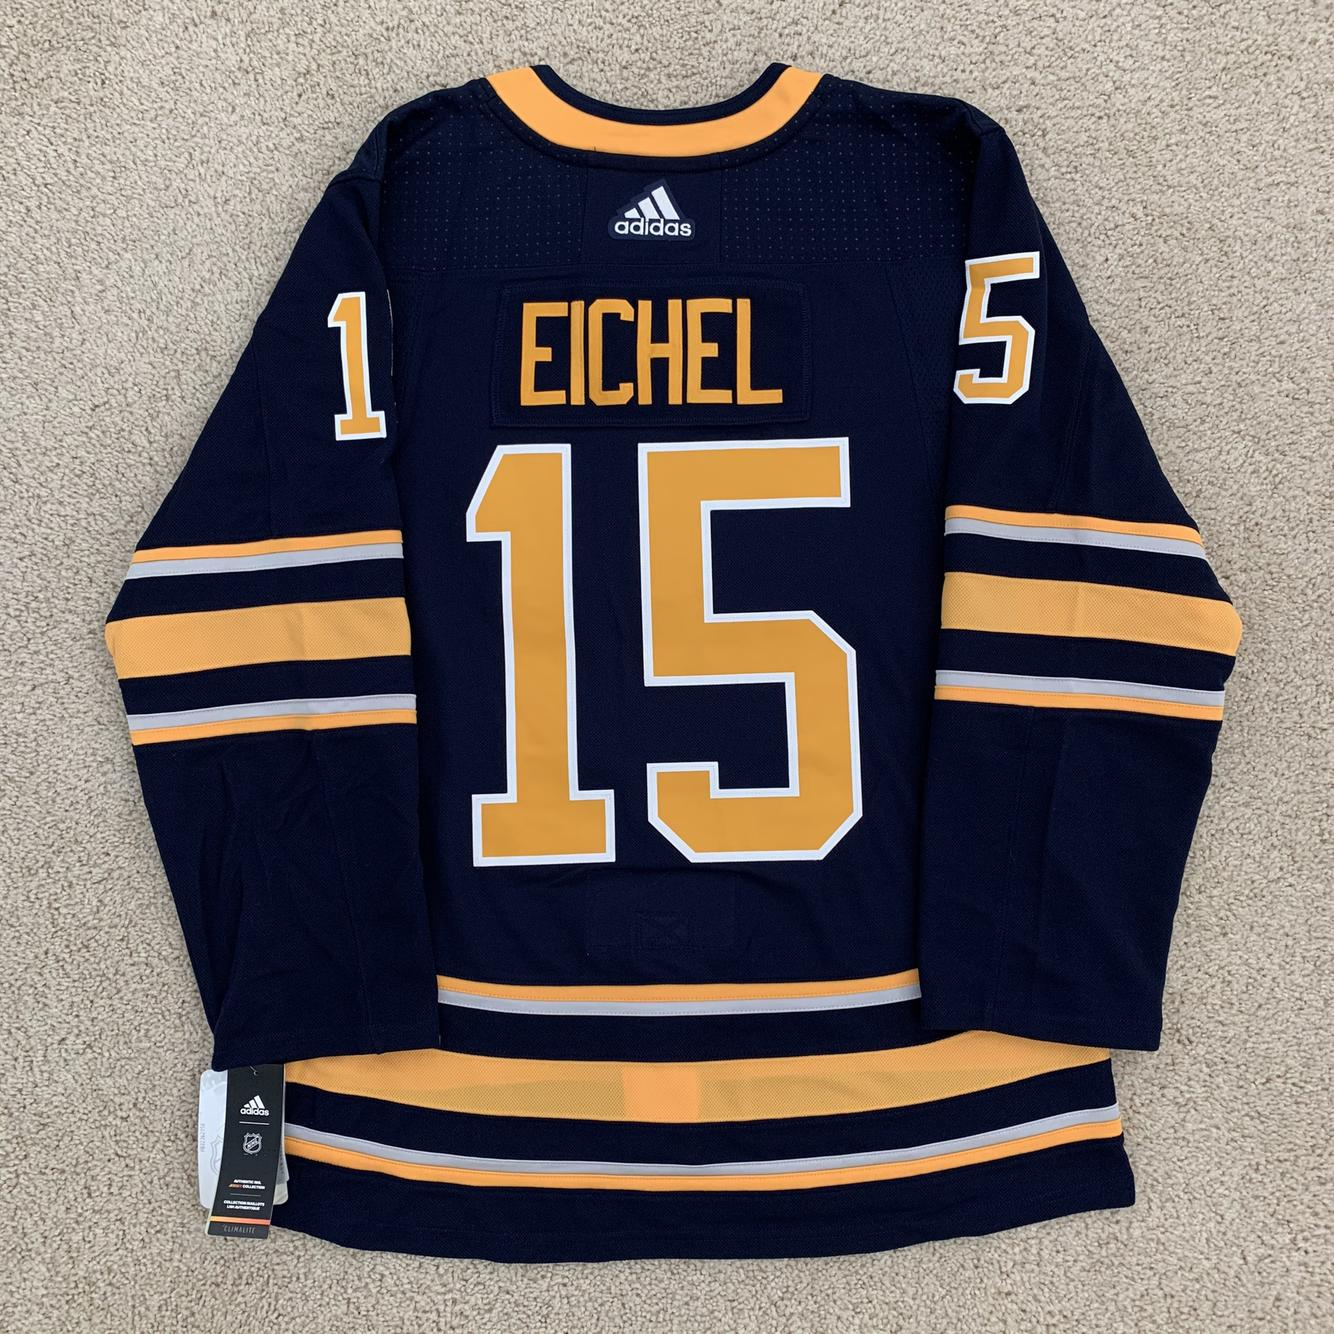 NEW! Authentic Jack Eichel Buffalo Sabres Adidas Home Hockey ...